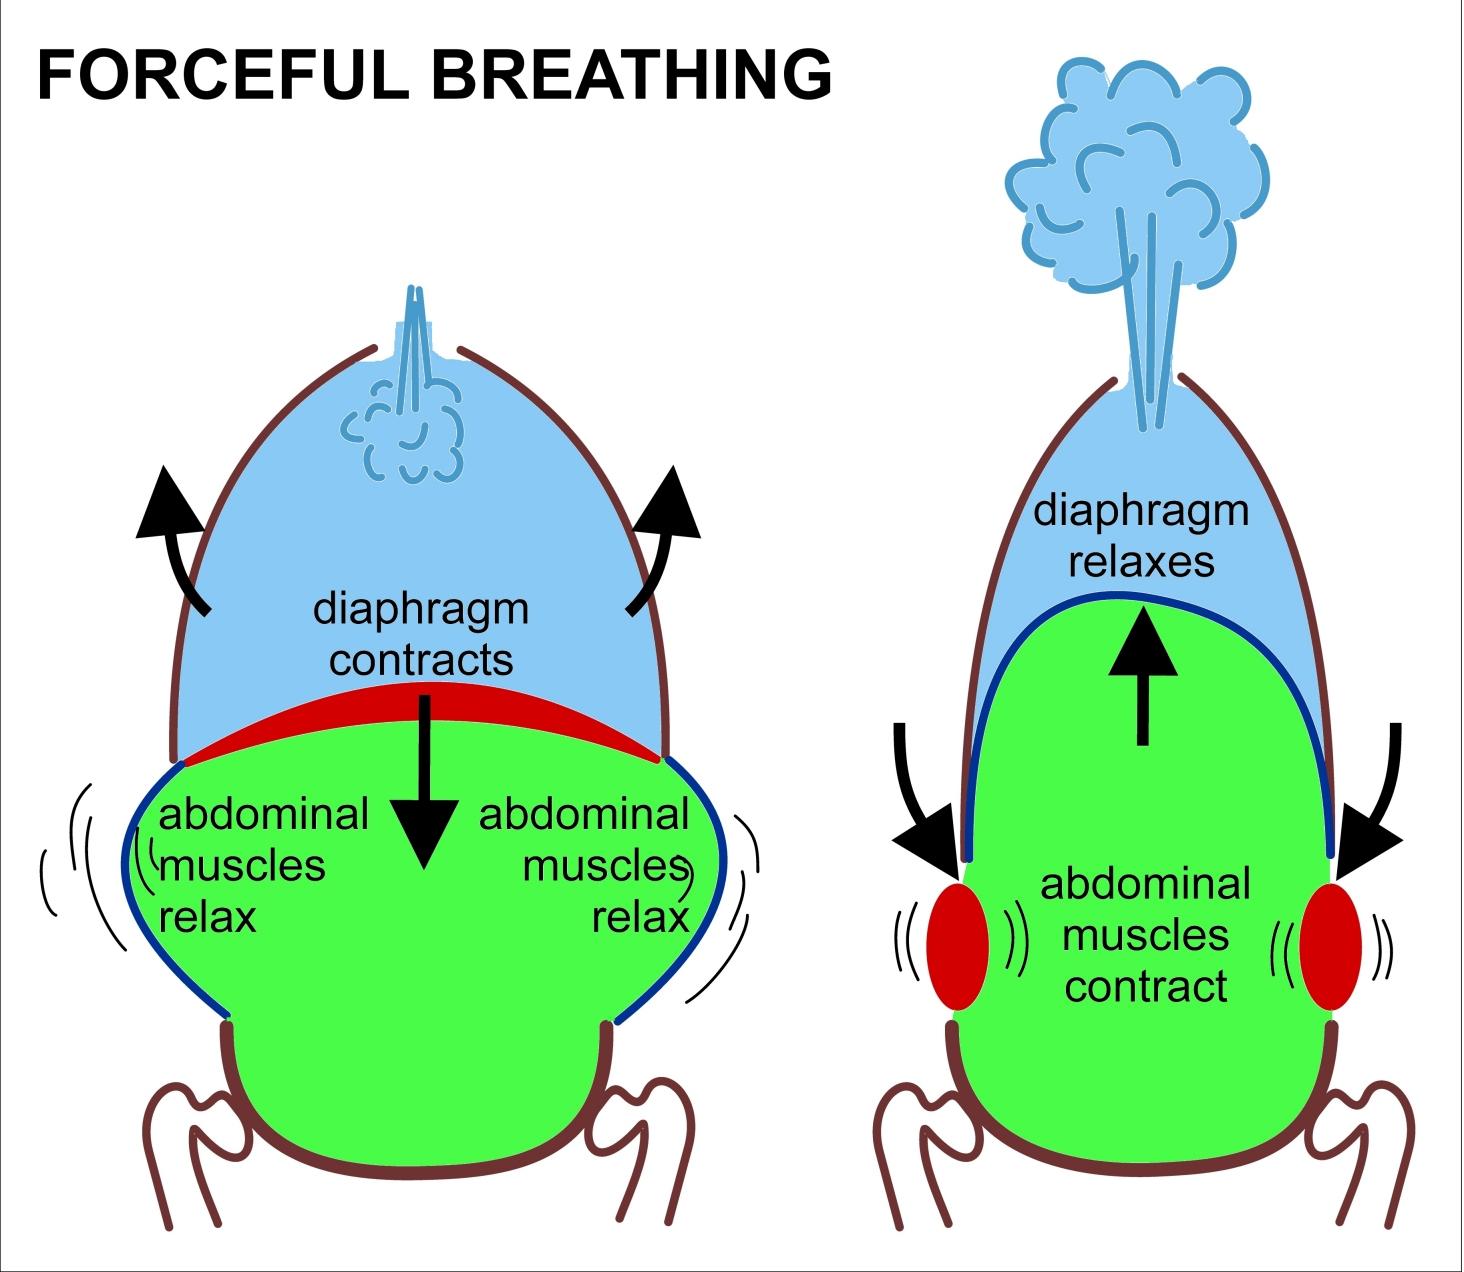 Forceful breathing diagram